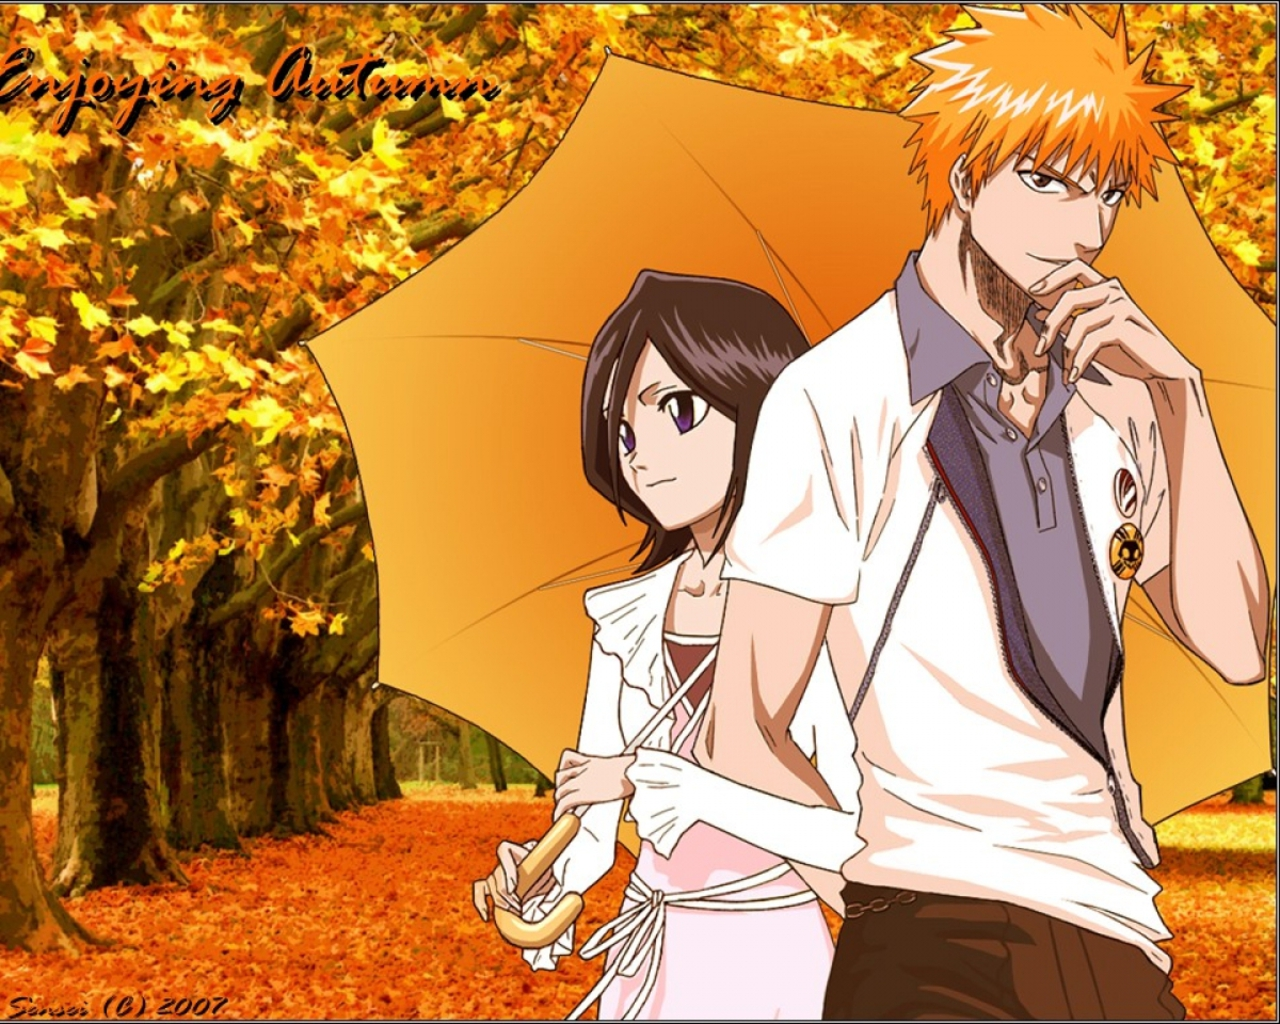 Rukia kuchiki and ichigo kurosaki